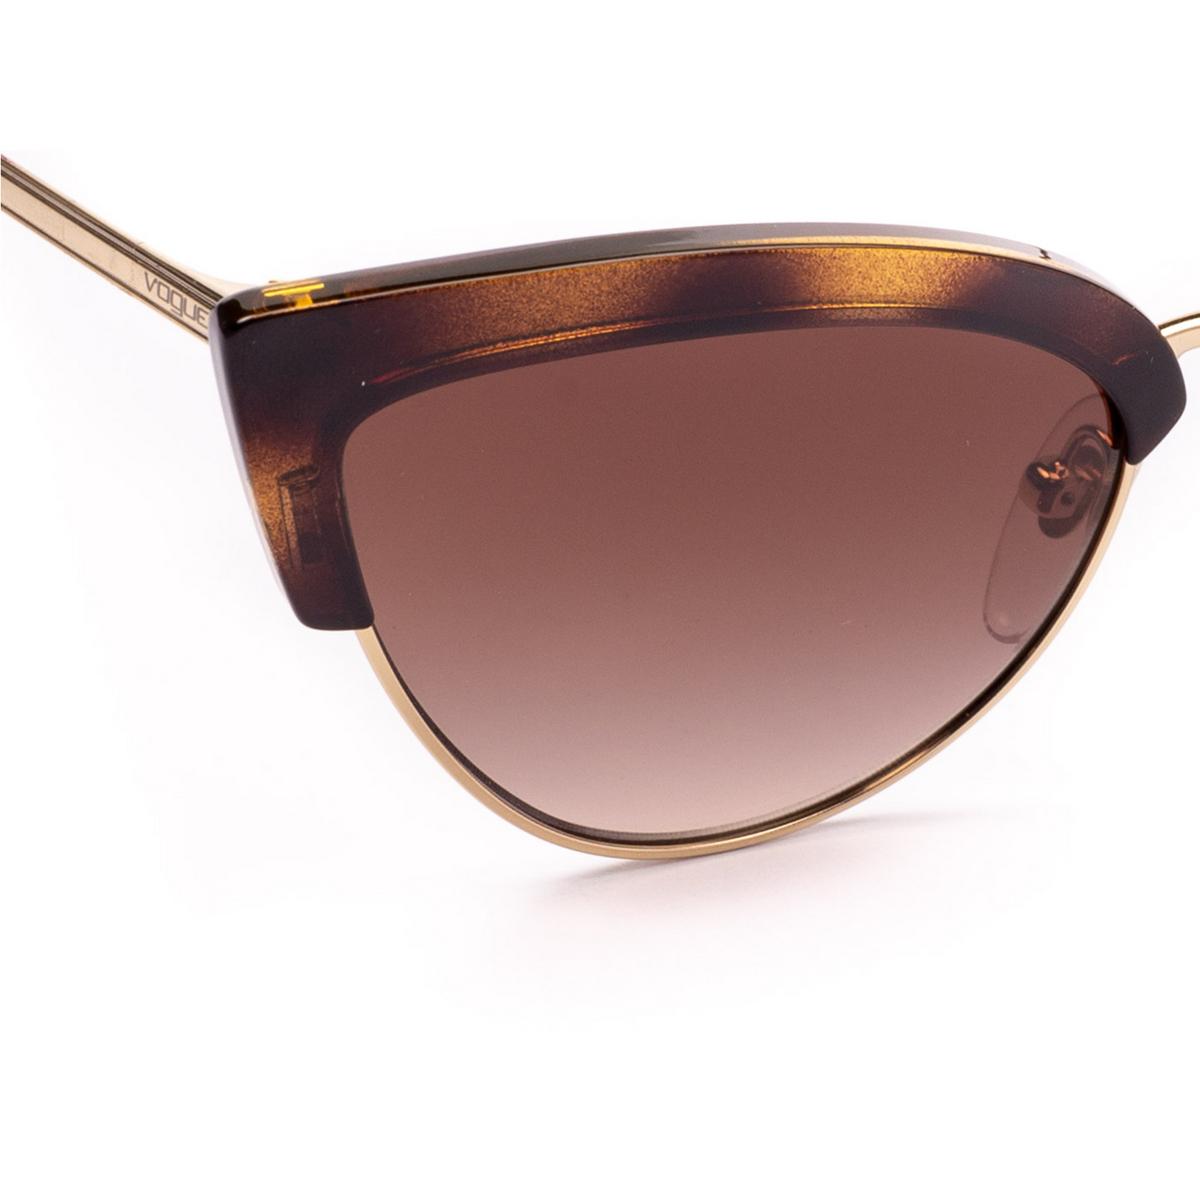 Vogue® Cat-eye Sunglasses: VO5212S color Top Dark Havana / Pale Gold W65613 - 3/4.